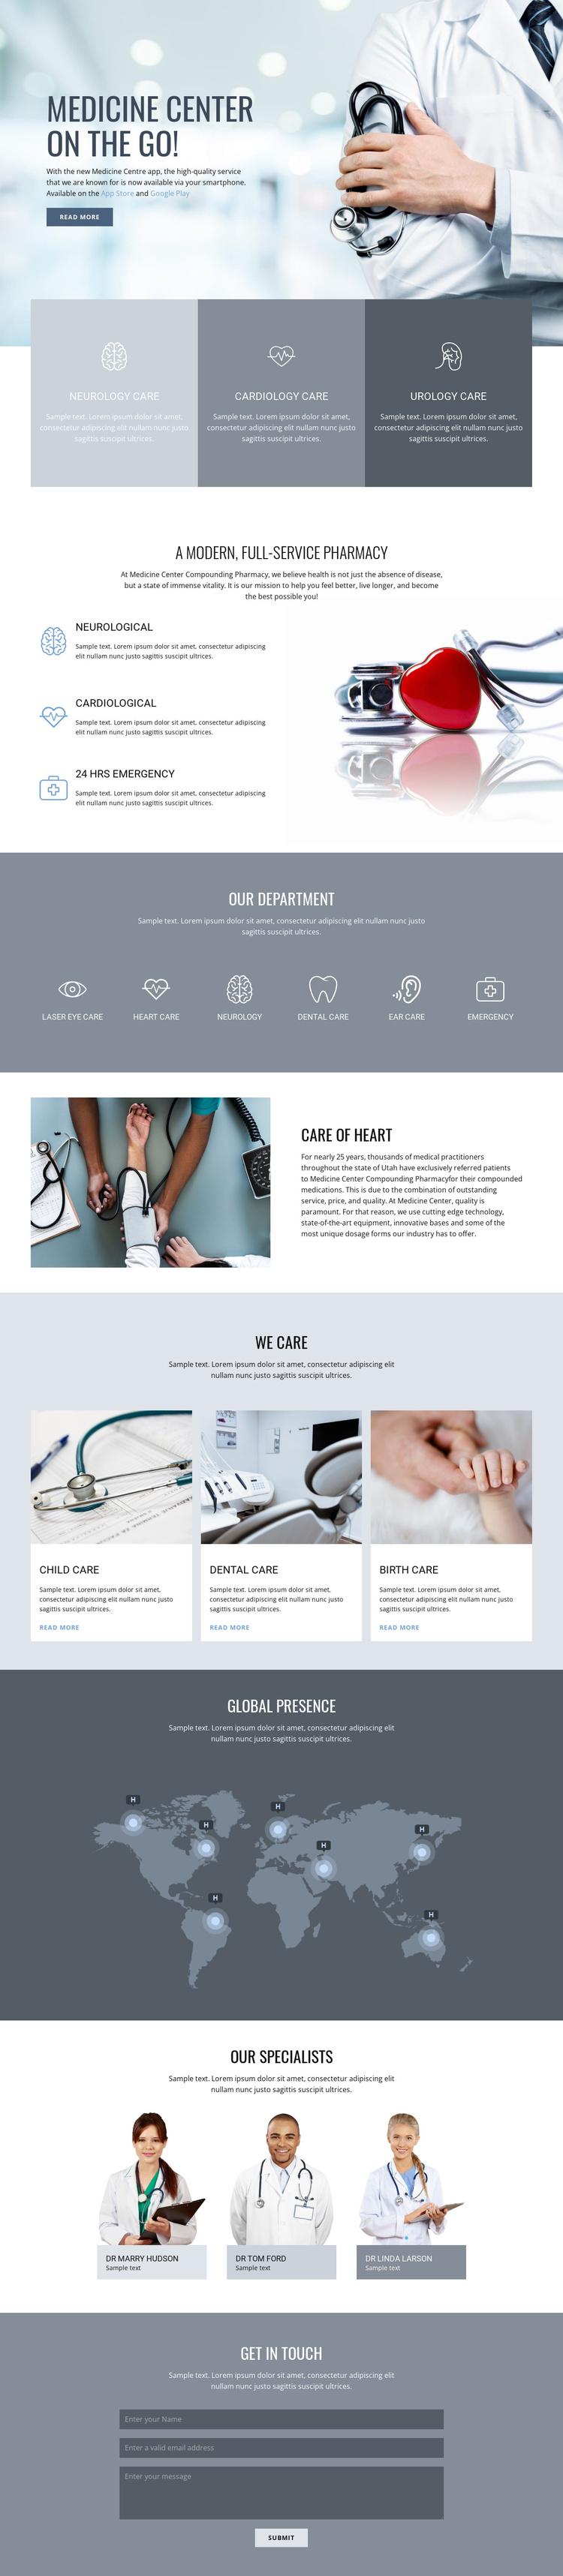 Center of quality medicine Joomla Template